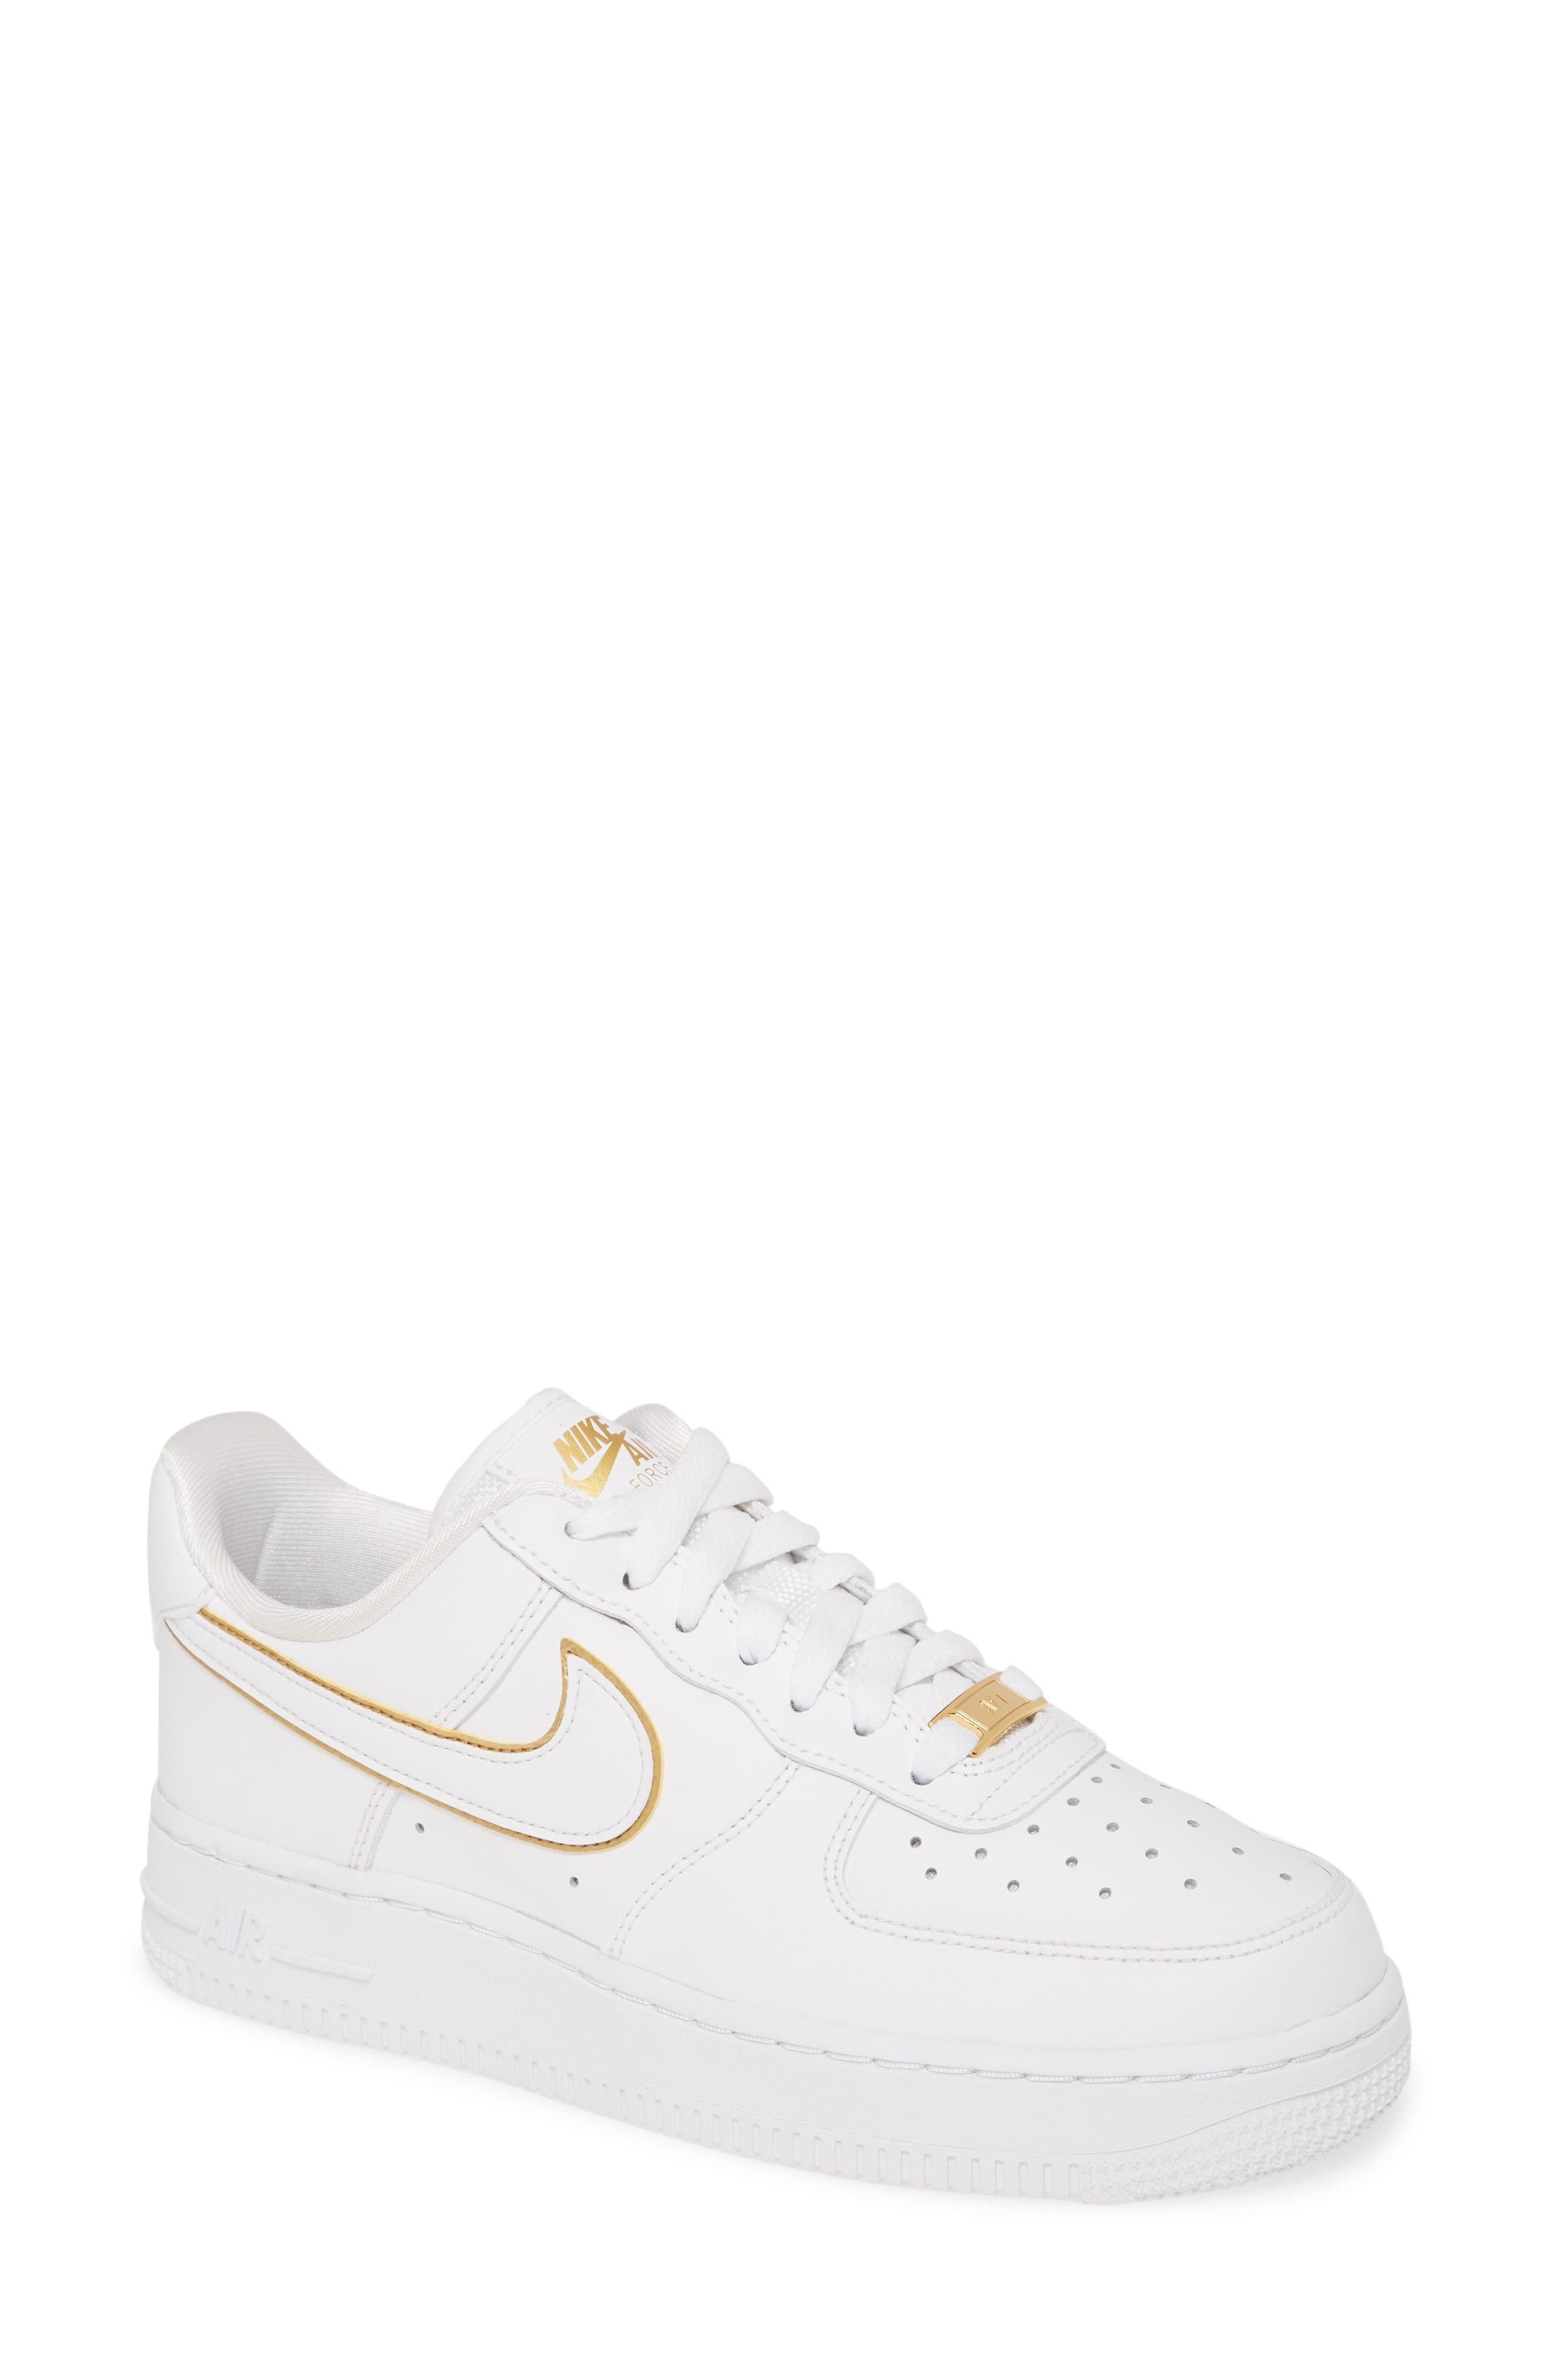 Nike Air Force 1 07 Ess Sneaker Women En 2020 Chaussures Nike Chaussure Sneakers Chaussure Mode